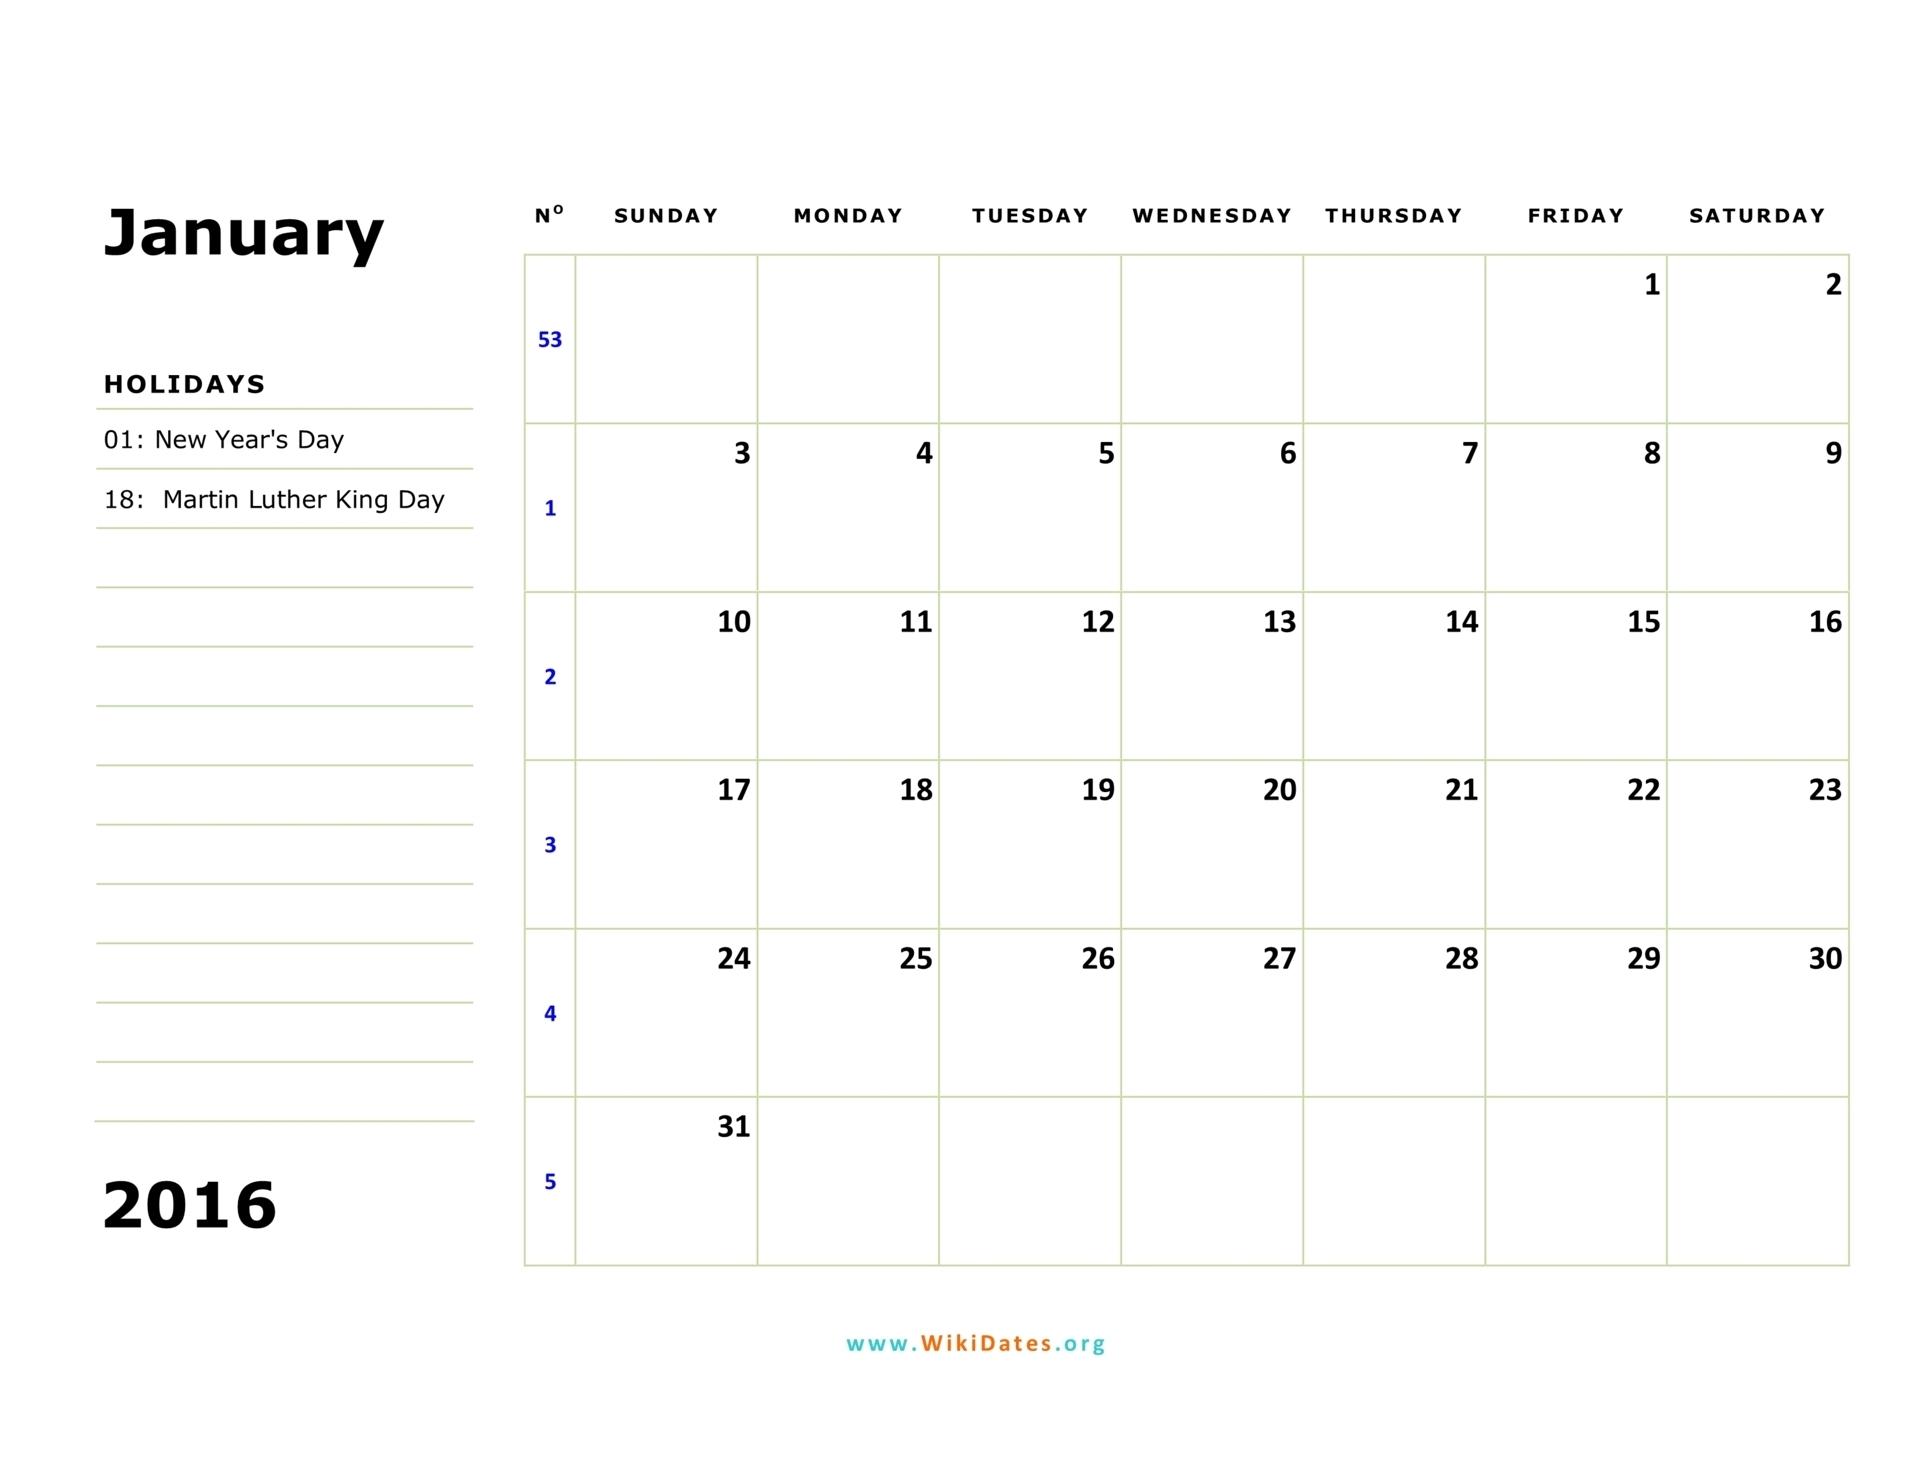 2016 Calendar Wikidates3abry